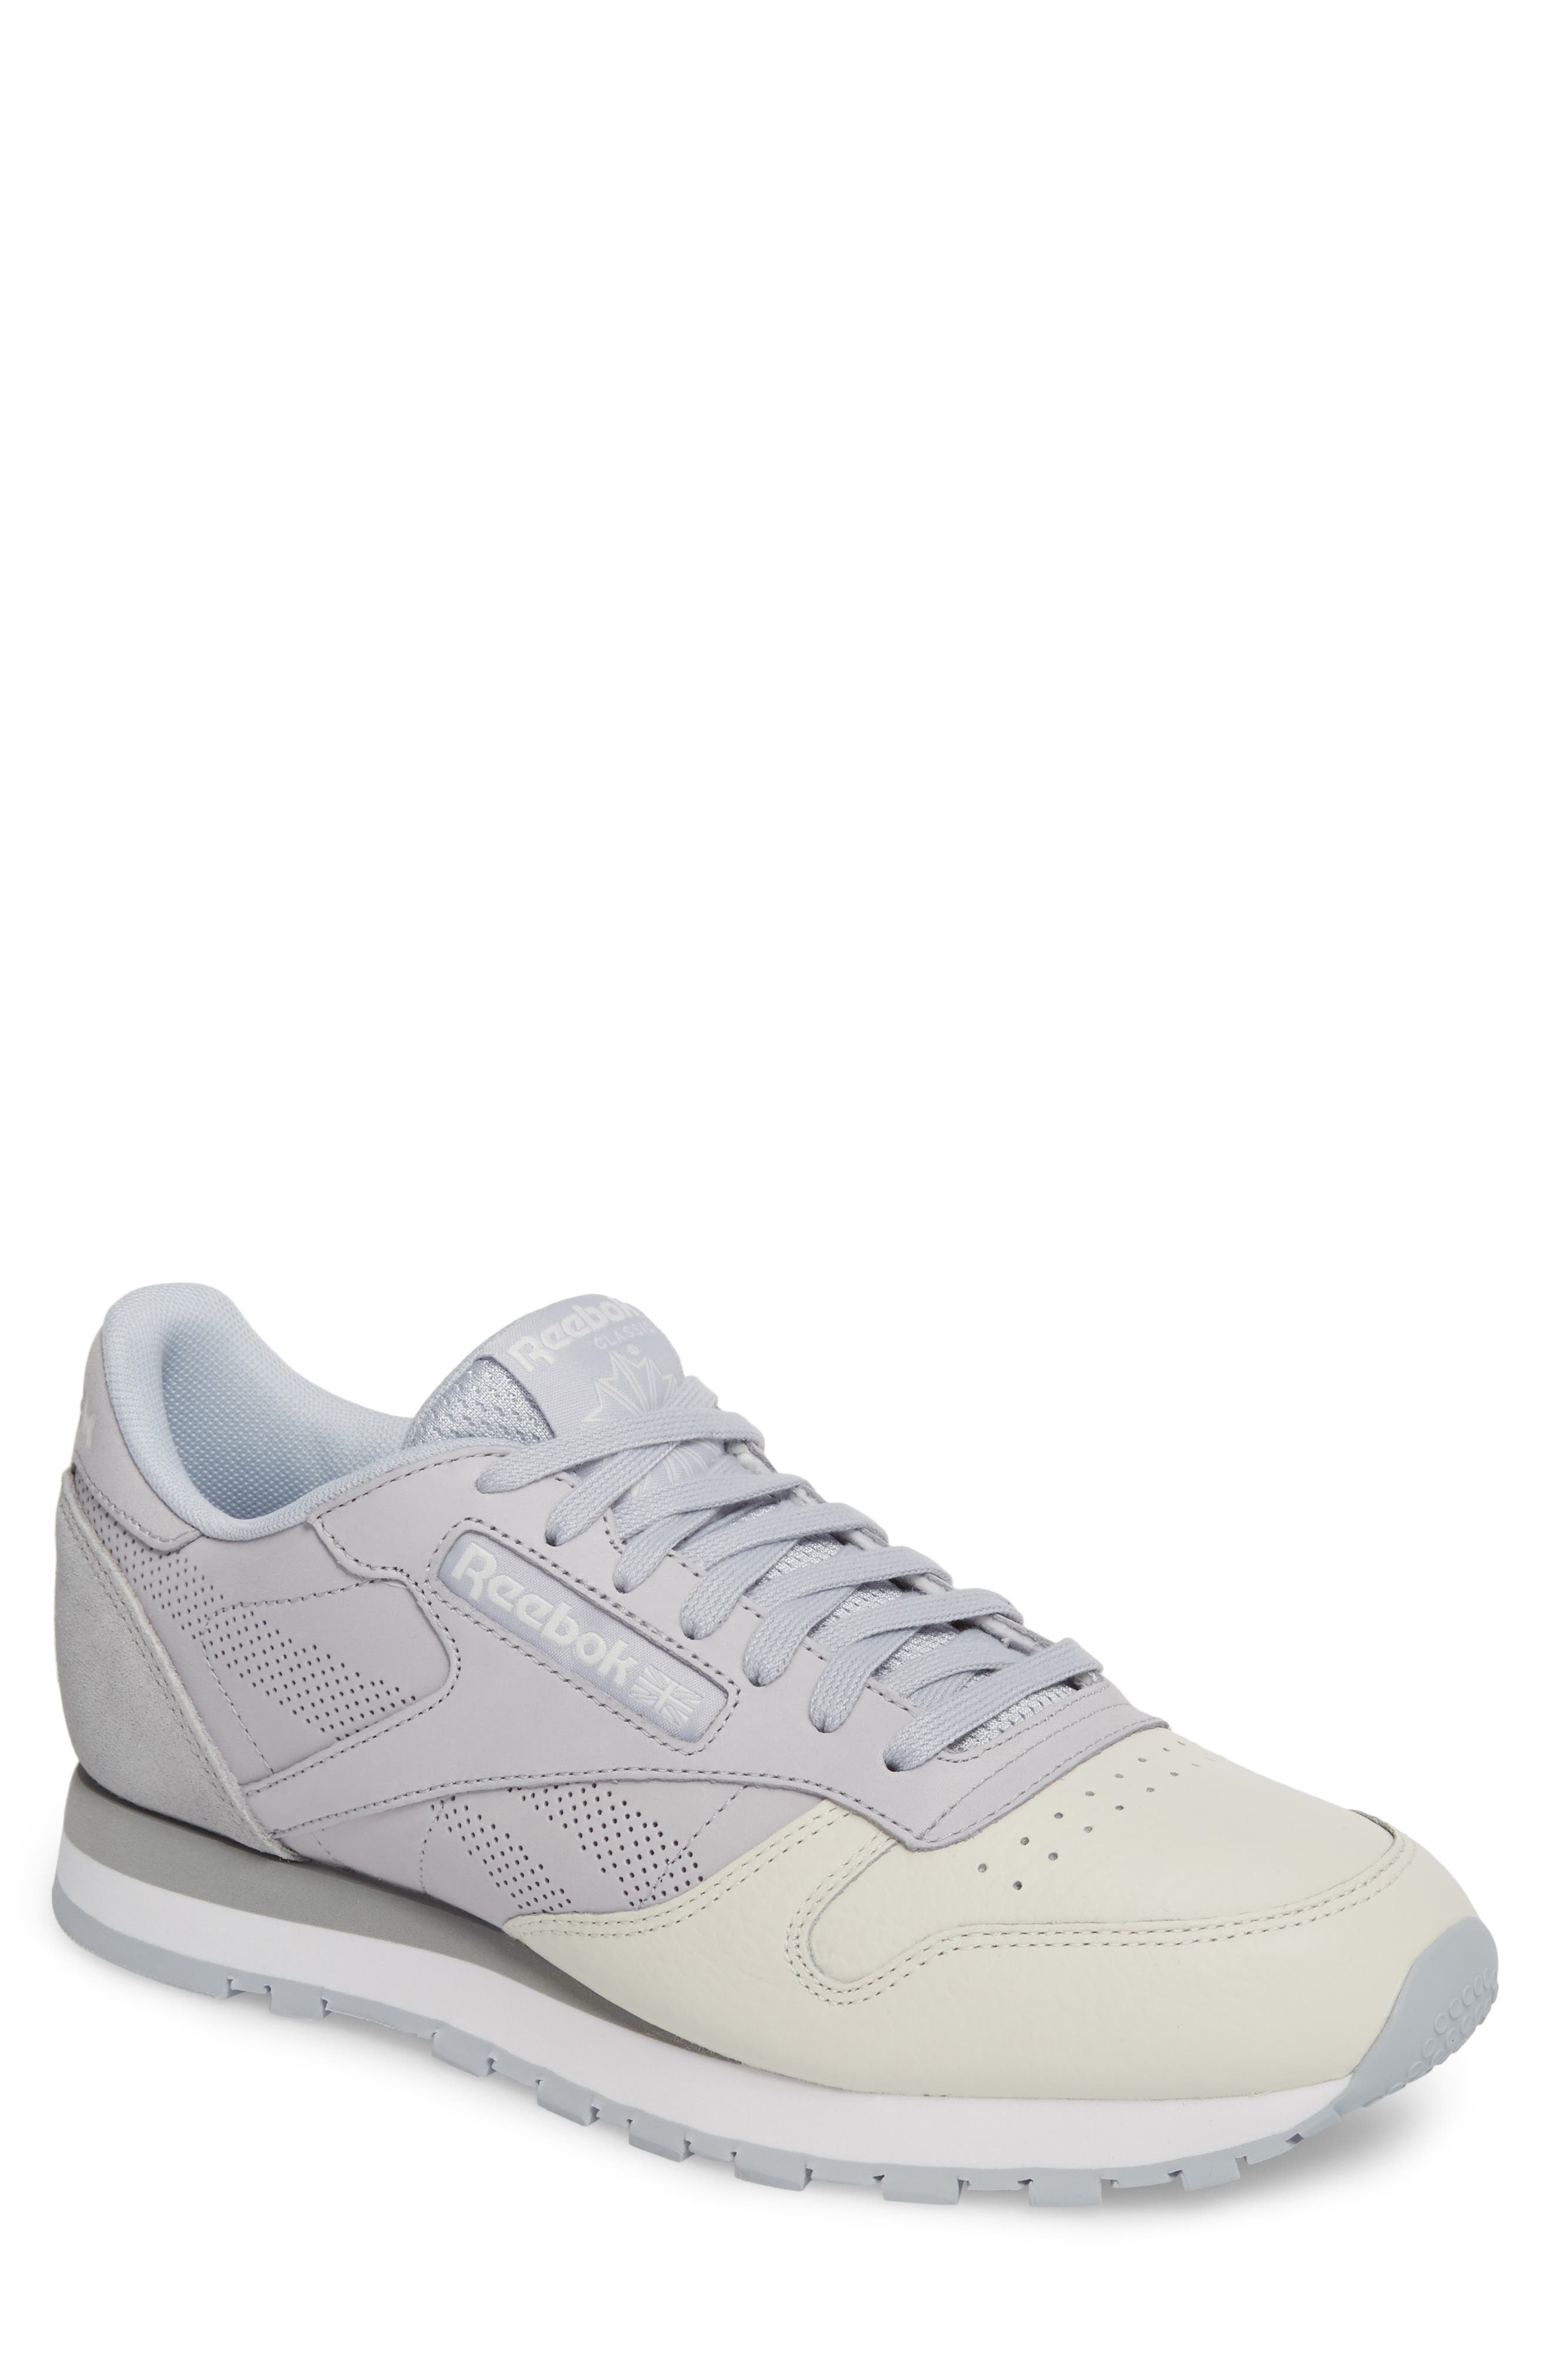 Classic Leather UE Sneaker,                         Main,                         color, Grey/ Chalk/ Stark Grey/ White